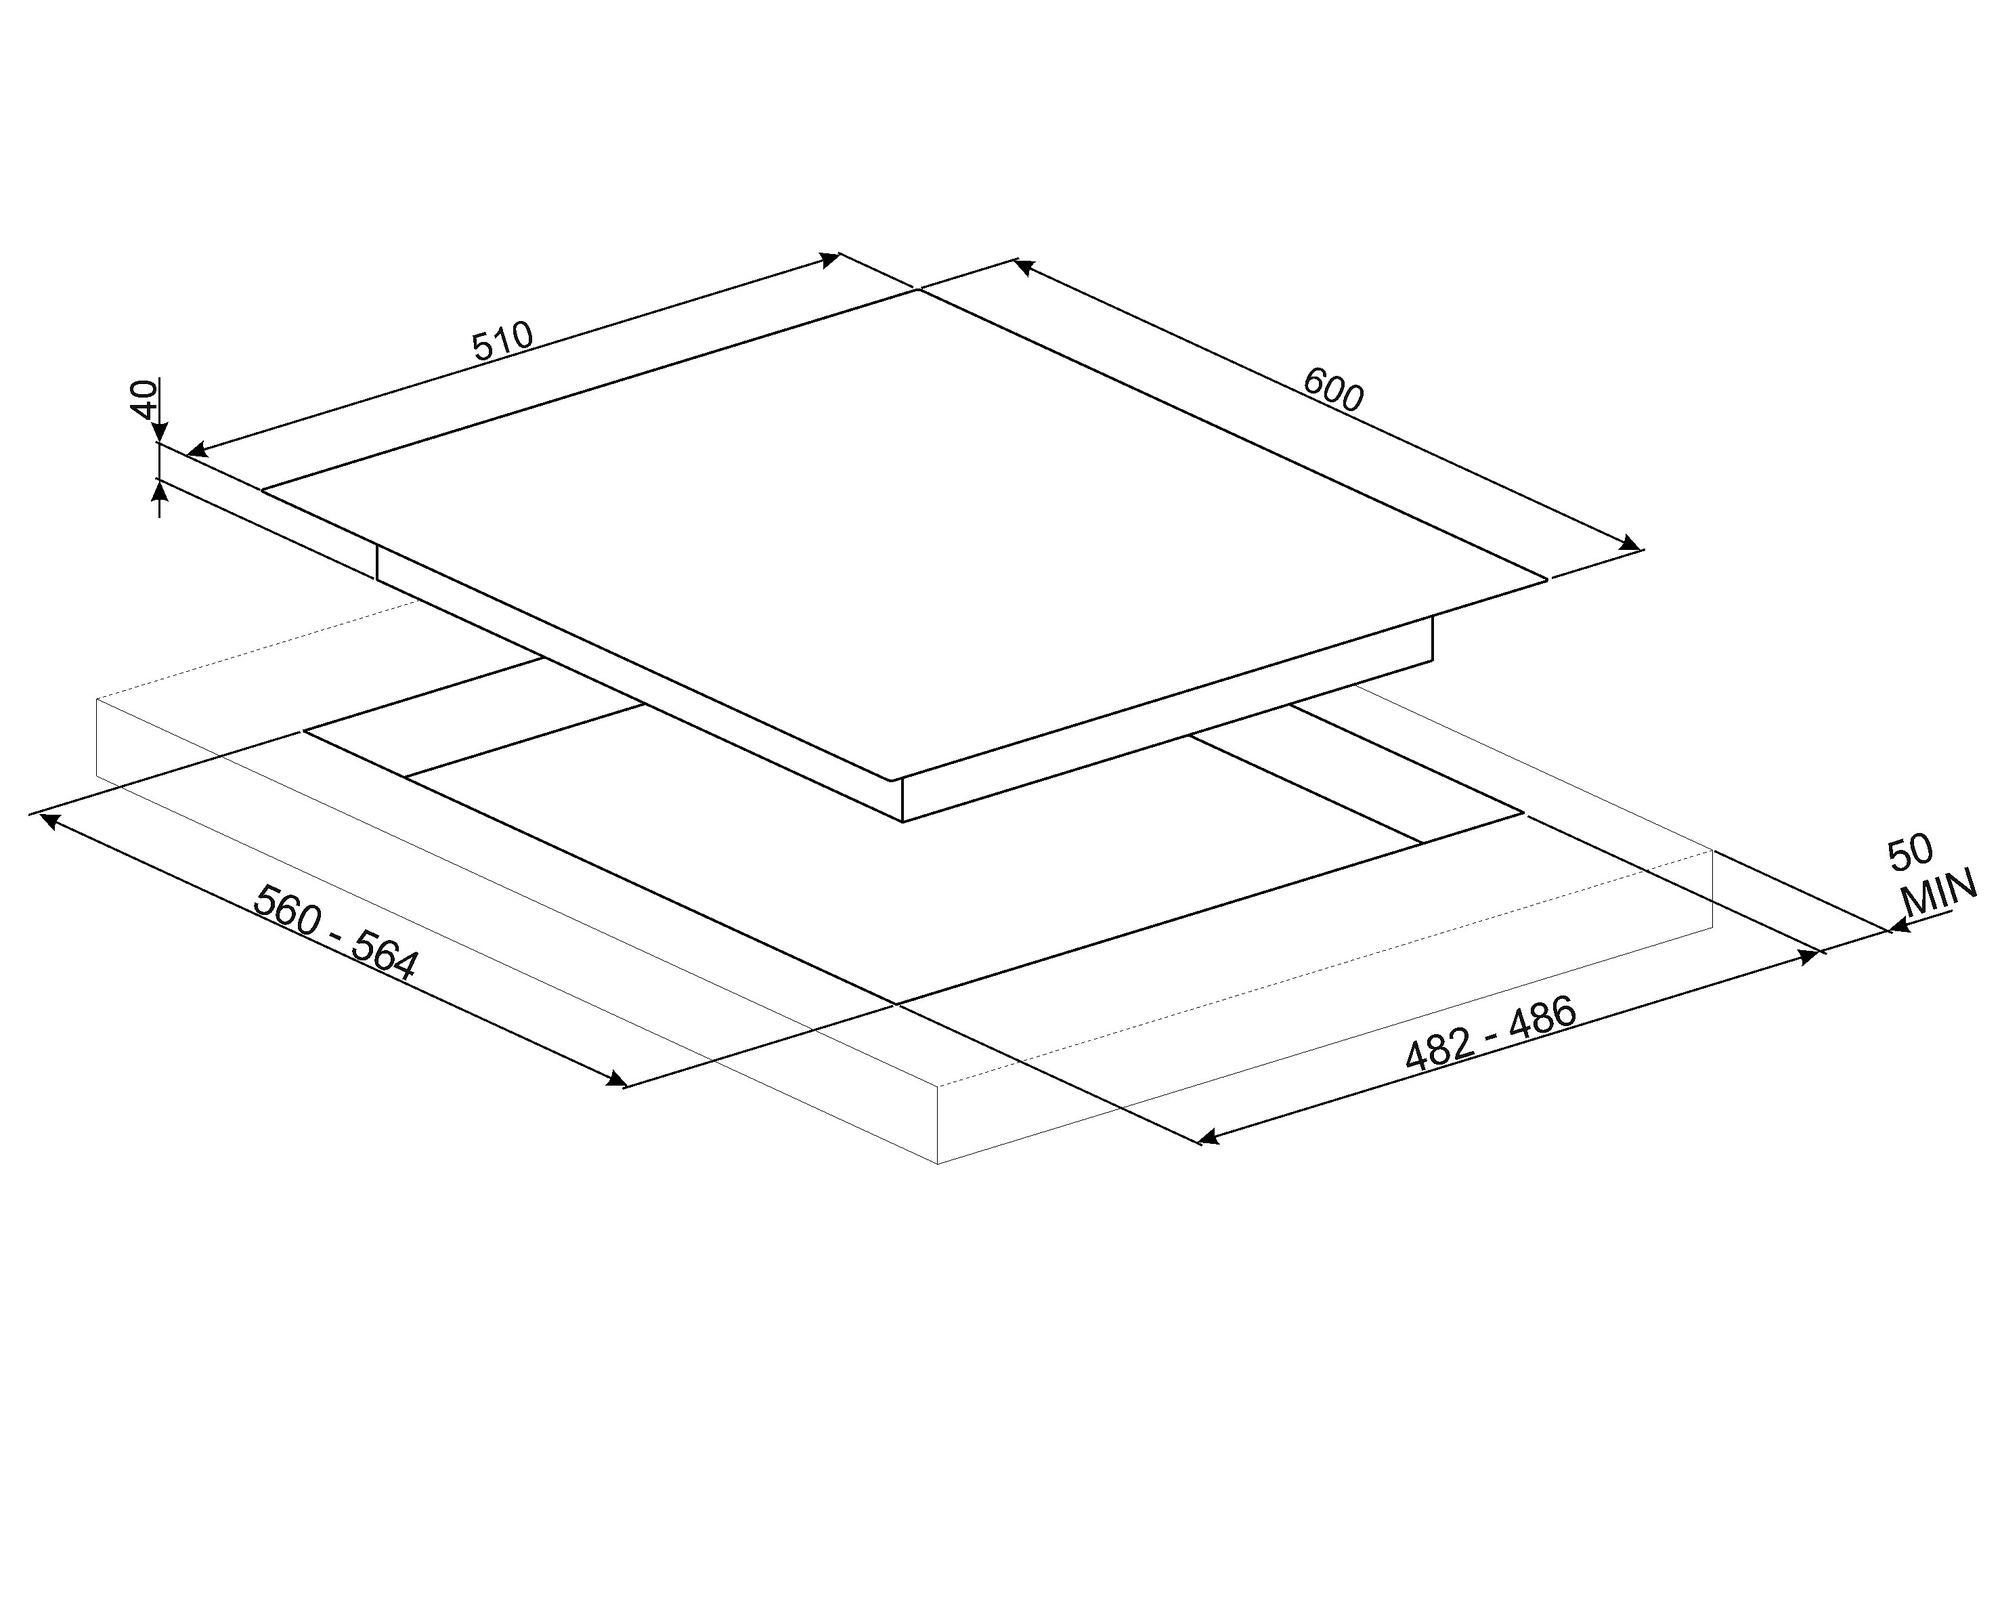 PV164CB Smeg 60cm White Ceramic Glass Gas Hob Technical Drawing (in mm)